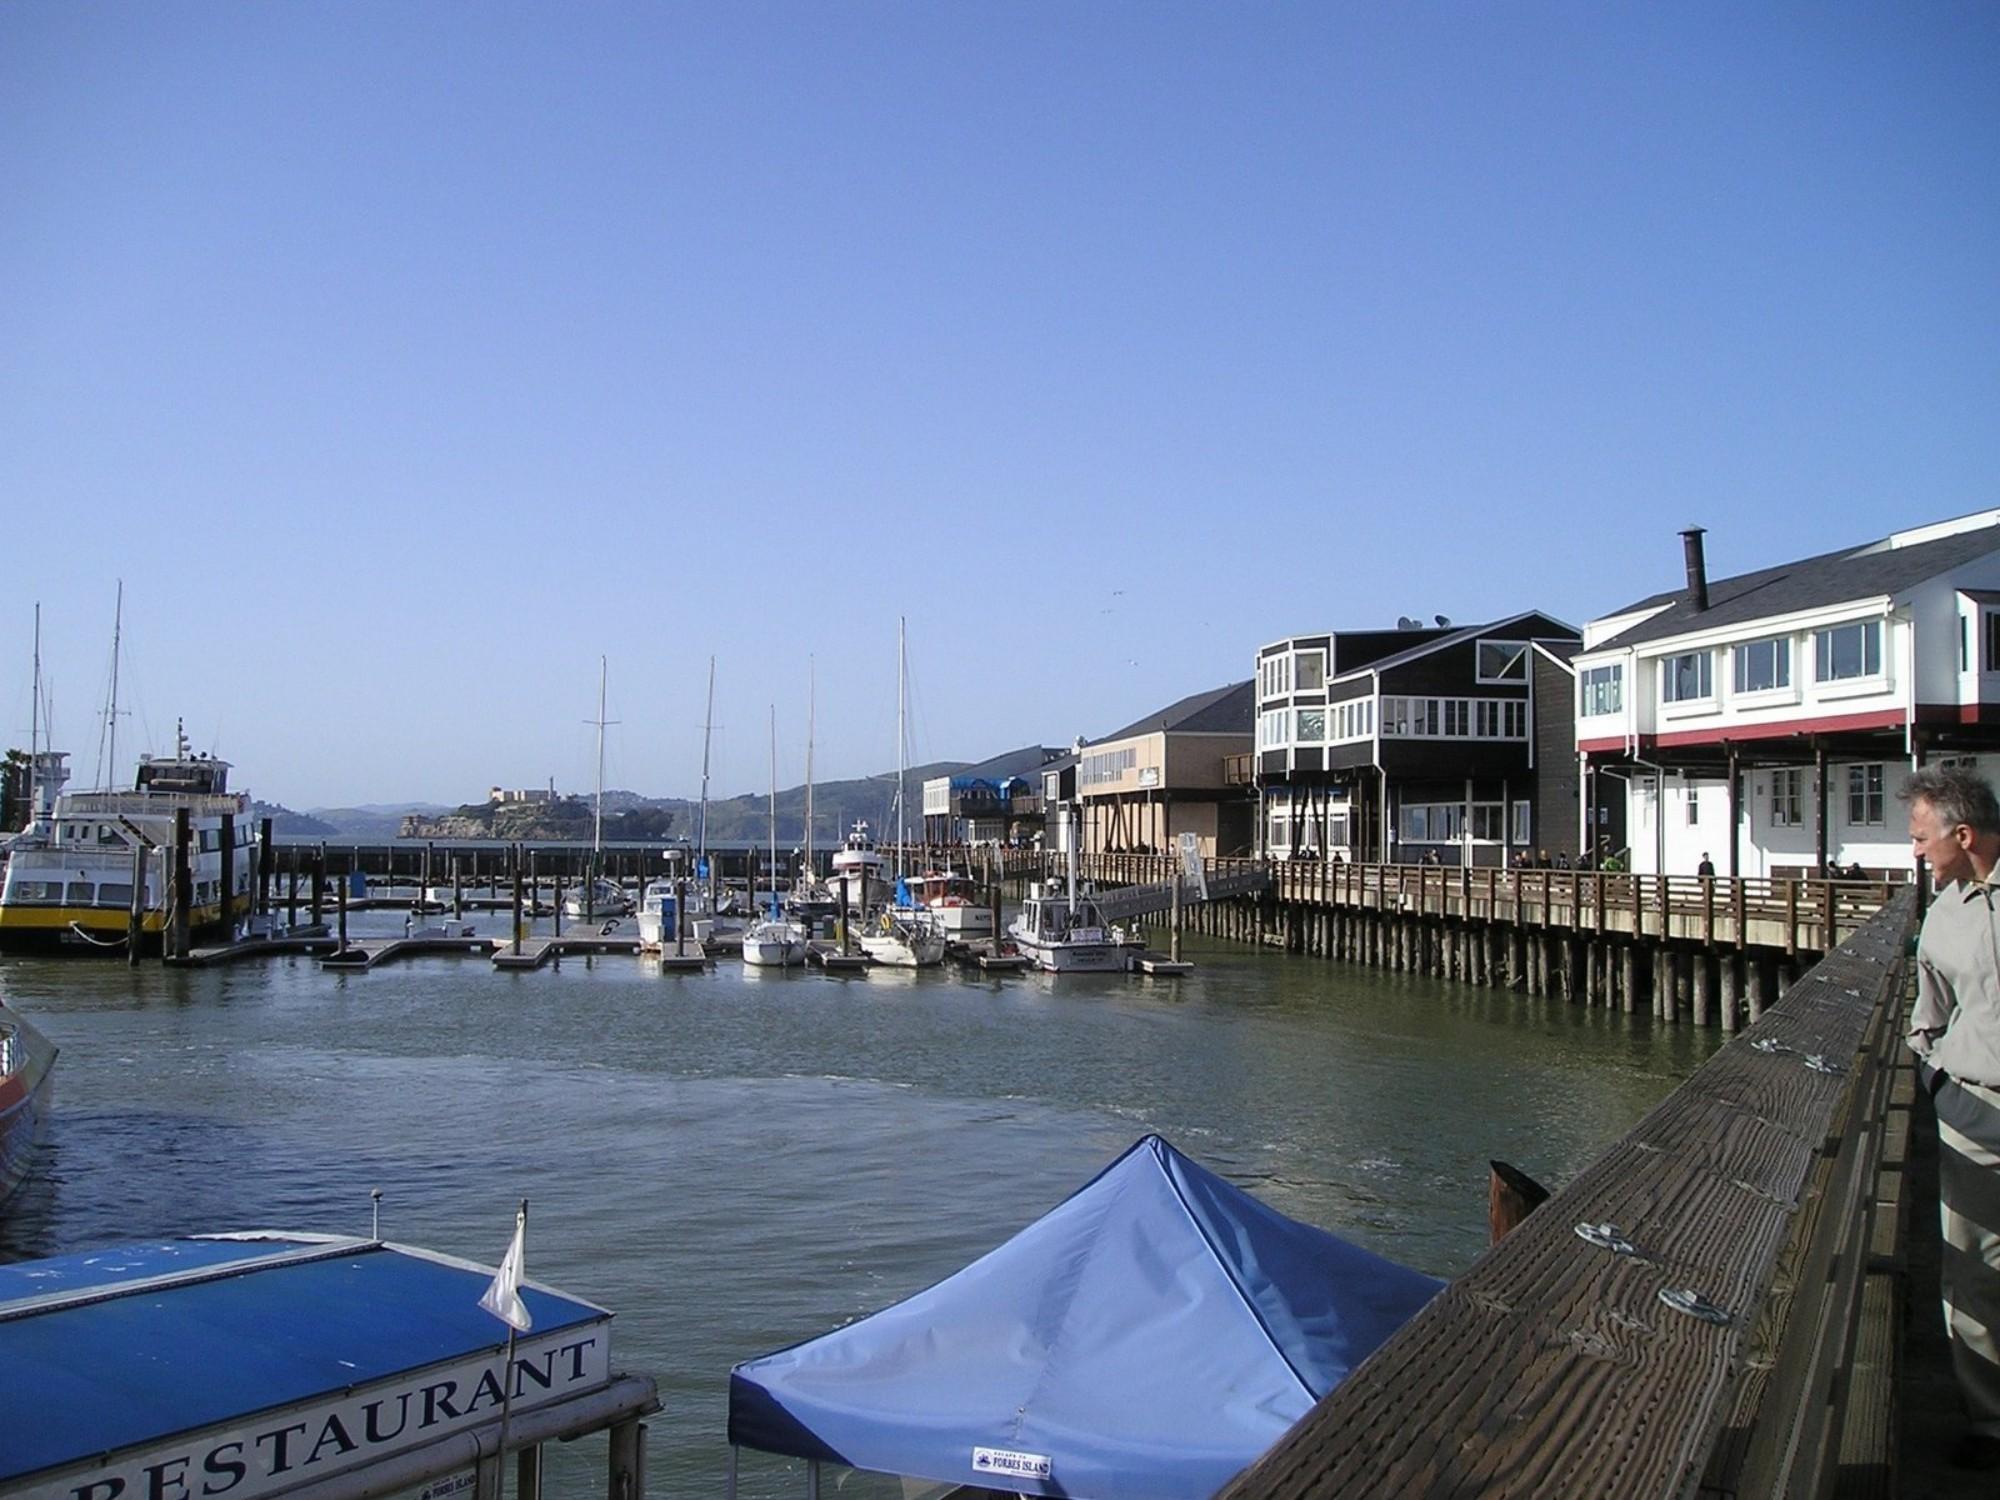 que ver San Francisco Pier 39